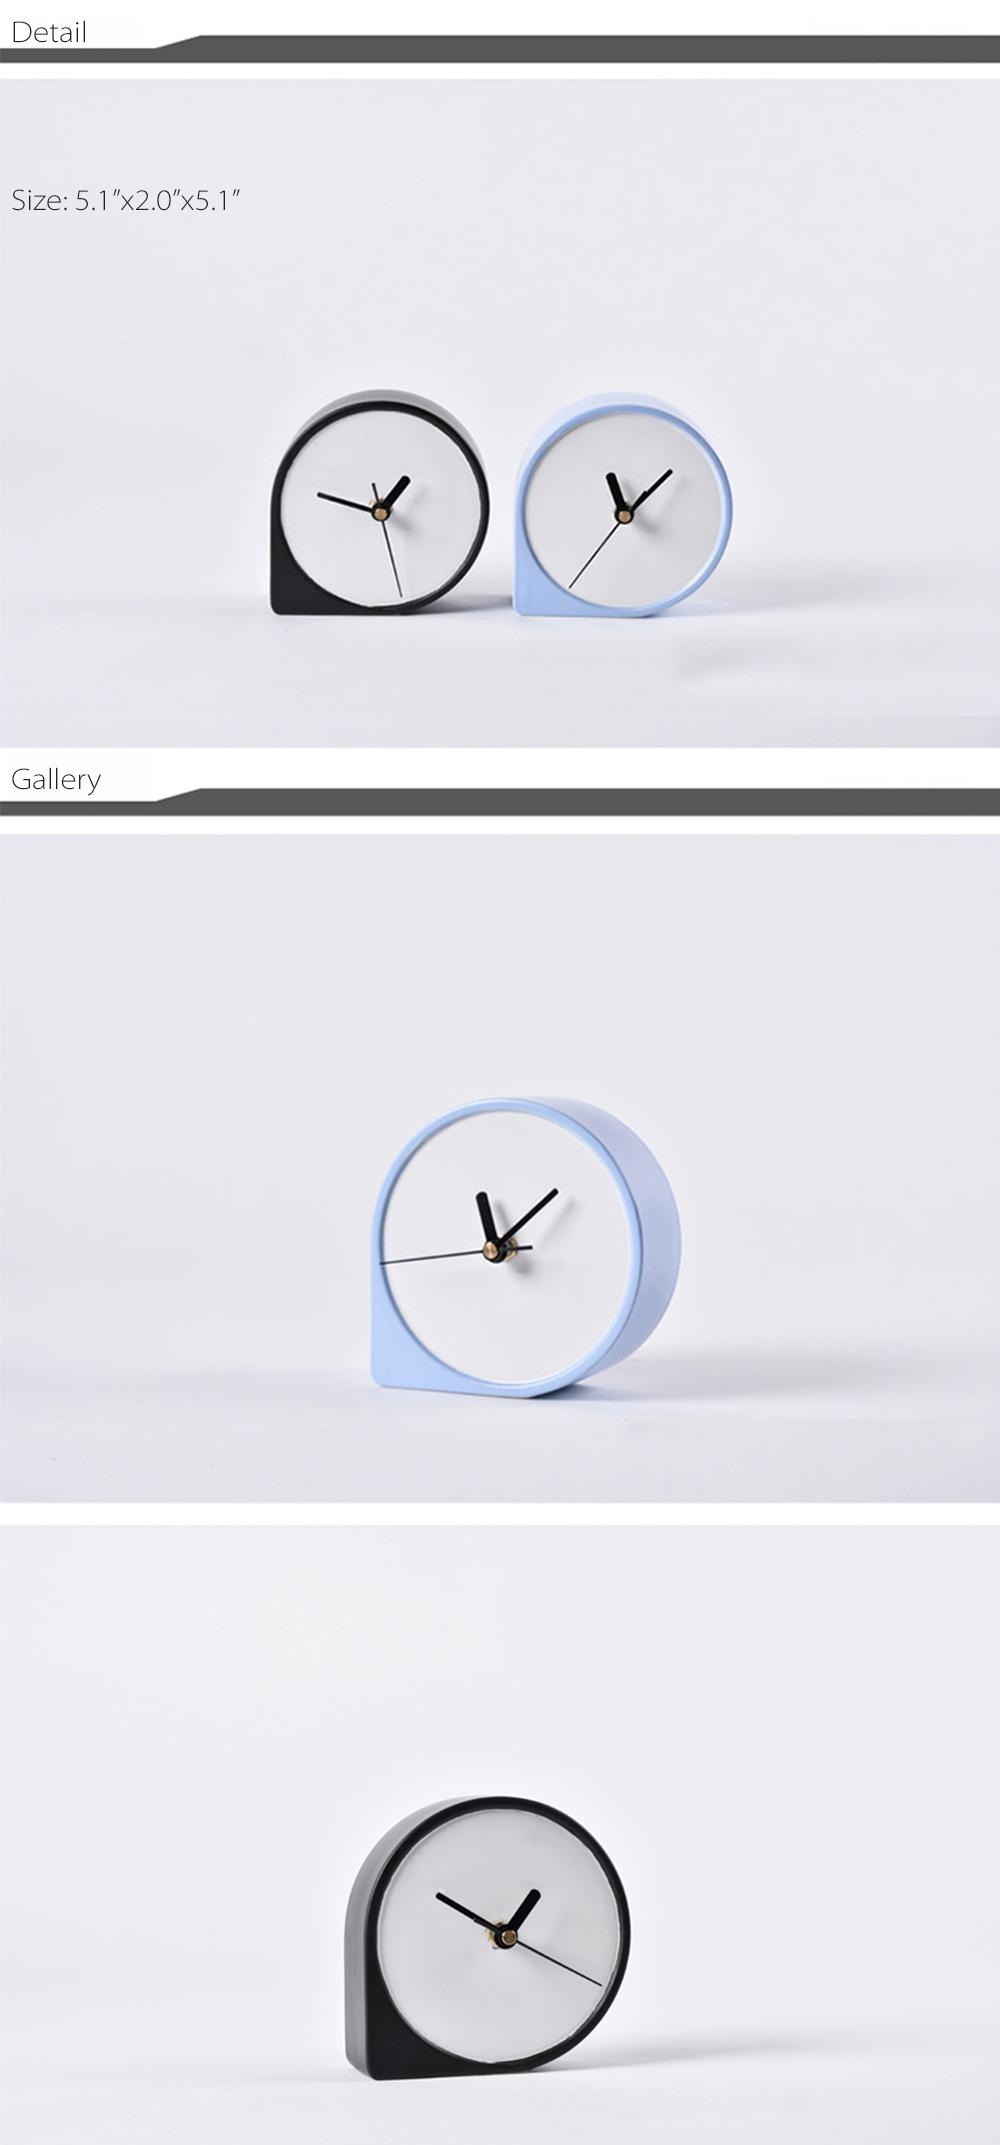 Comma Shaped Desk Clock Minimalist